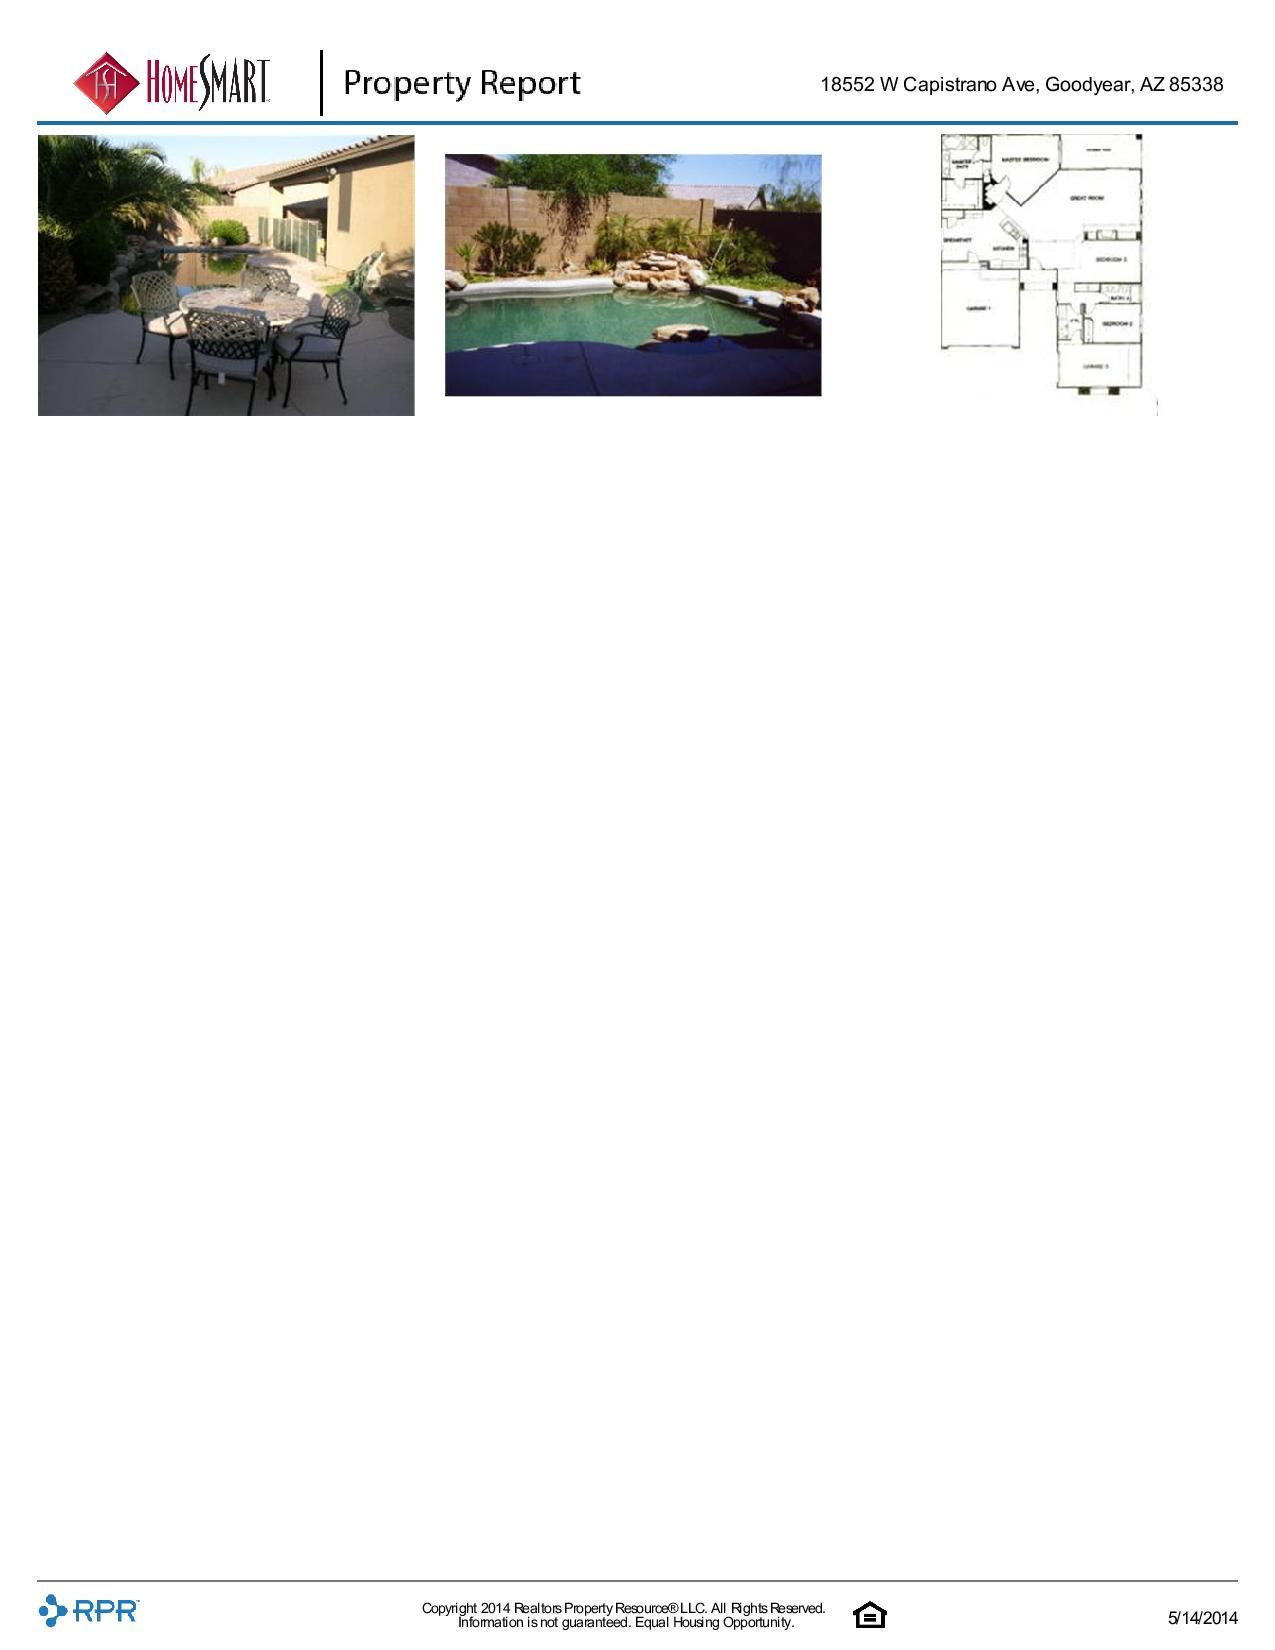 18552-W-Capistrano-Ave-Goodyear-AZ-85338-page-008